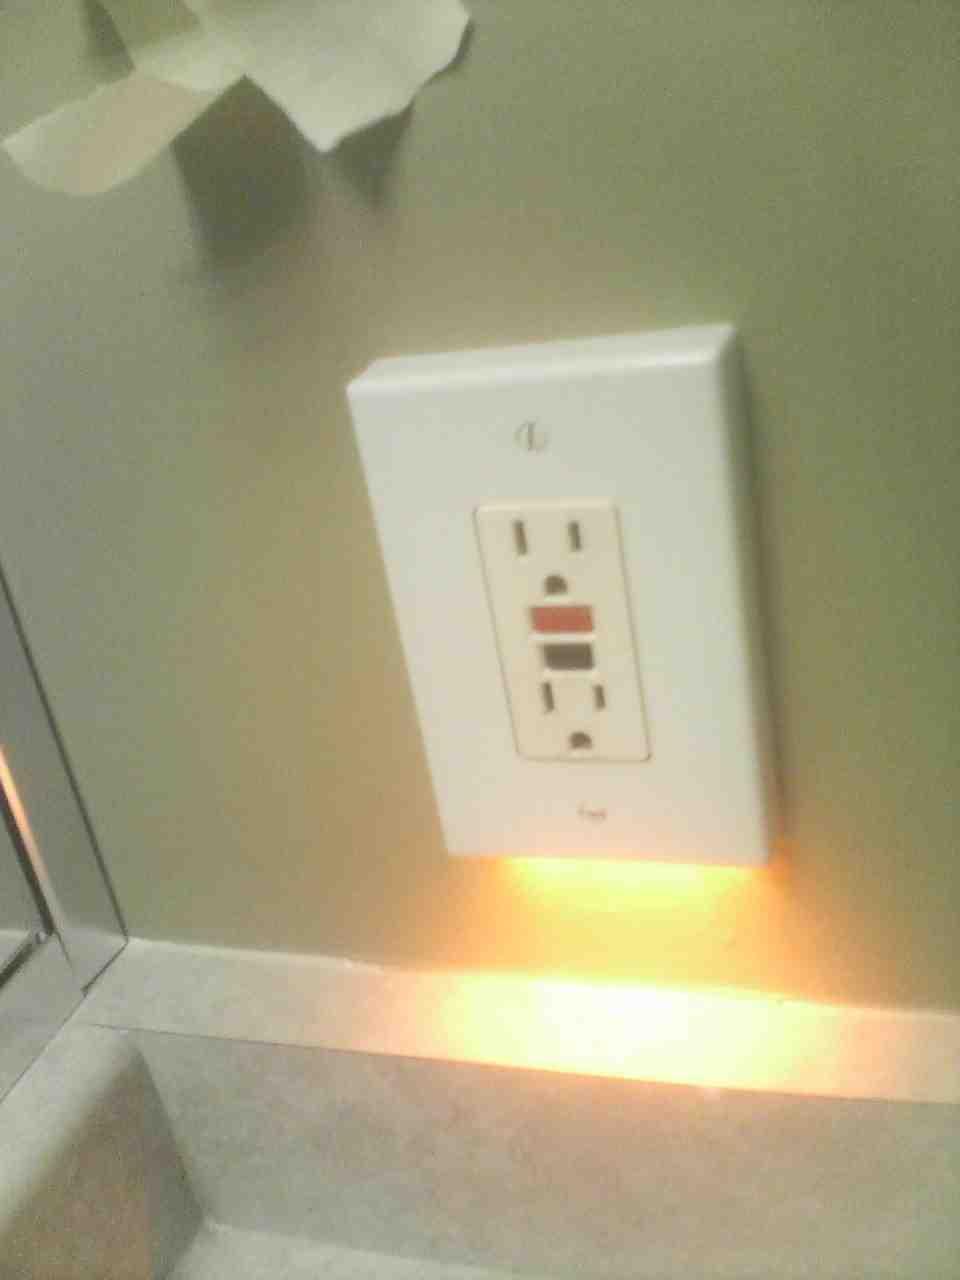 night light outlet-outlet.jpg